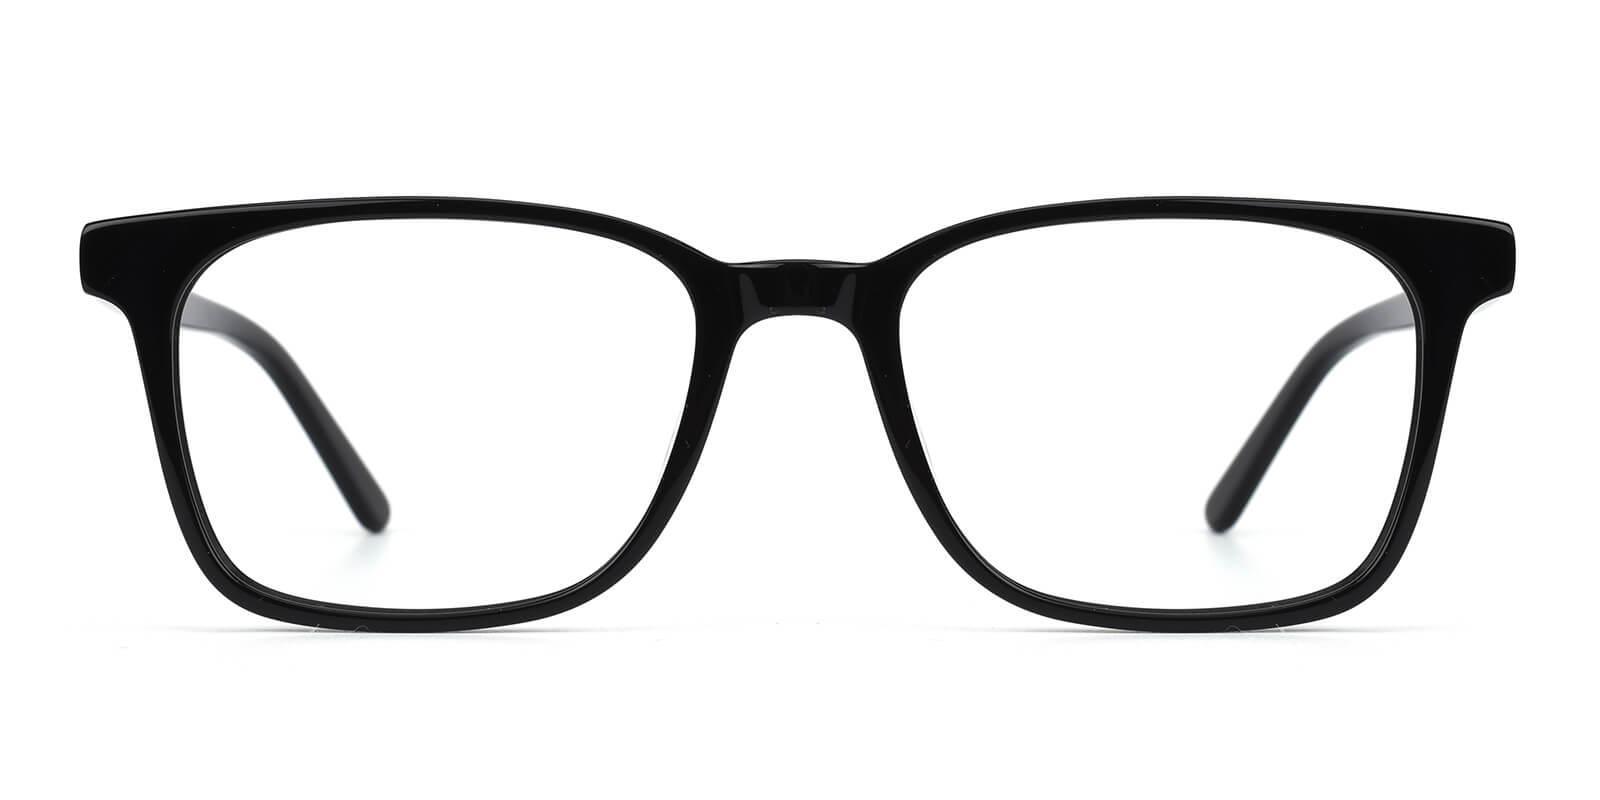 Kattan-Black-Square-Acetate-Eyeglasses-additional2